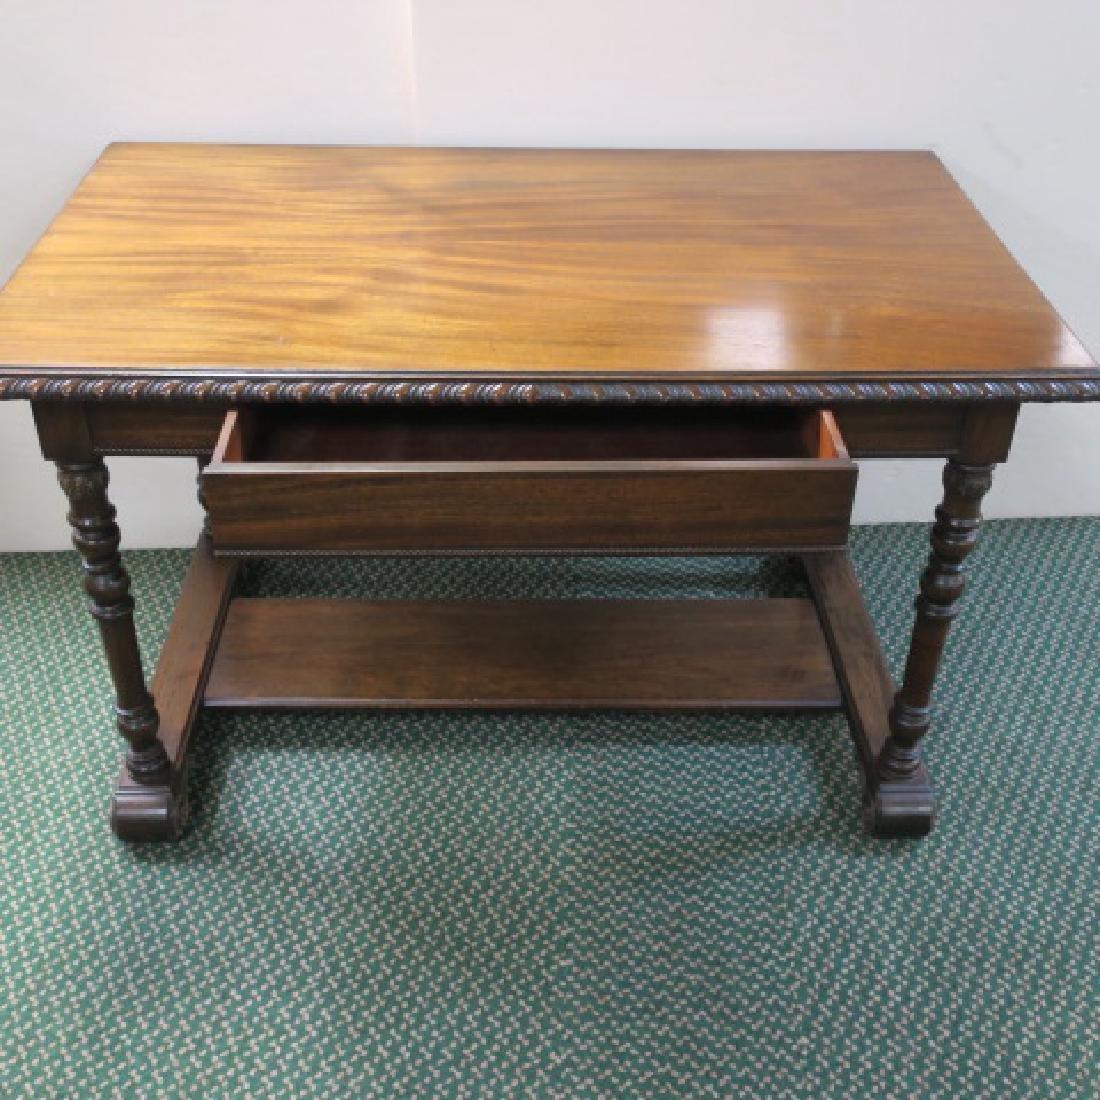 Mahogany Library Table with Trestle Base: - 4